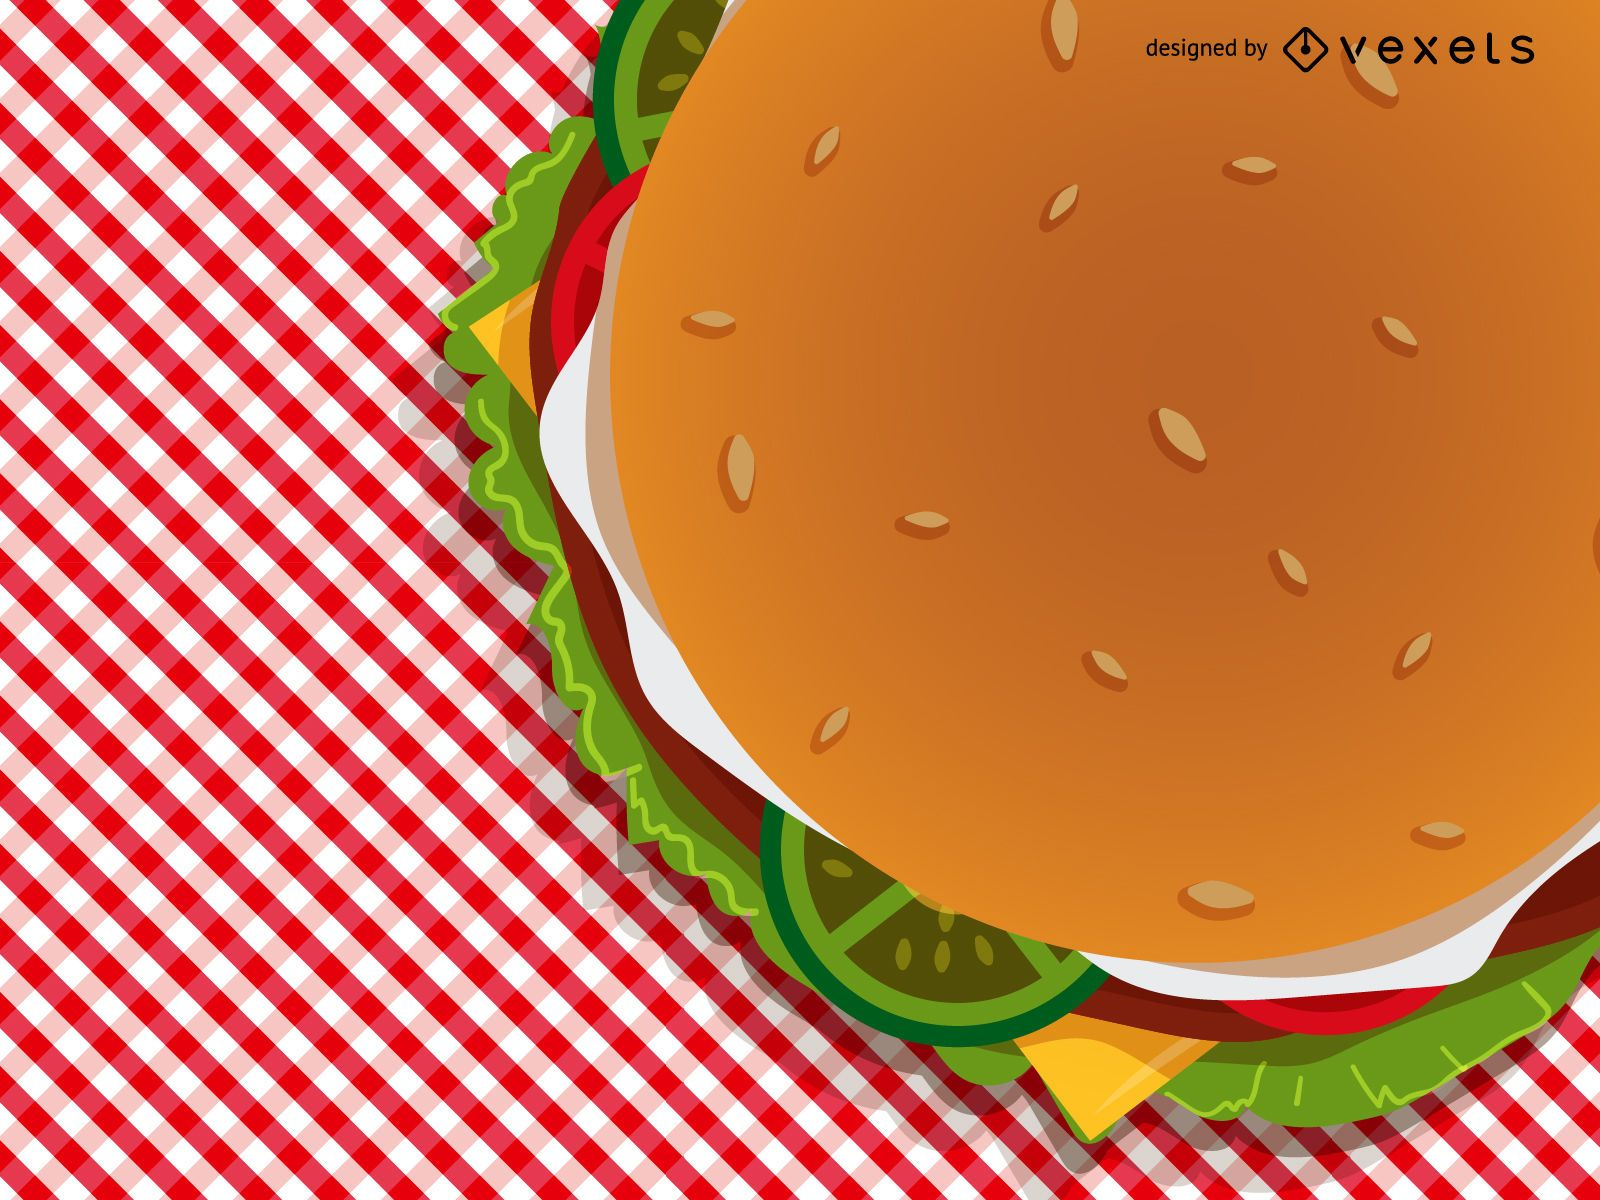 Burger on checkered tablecloth illustration